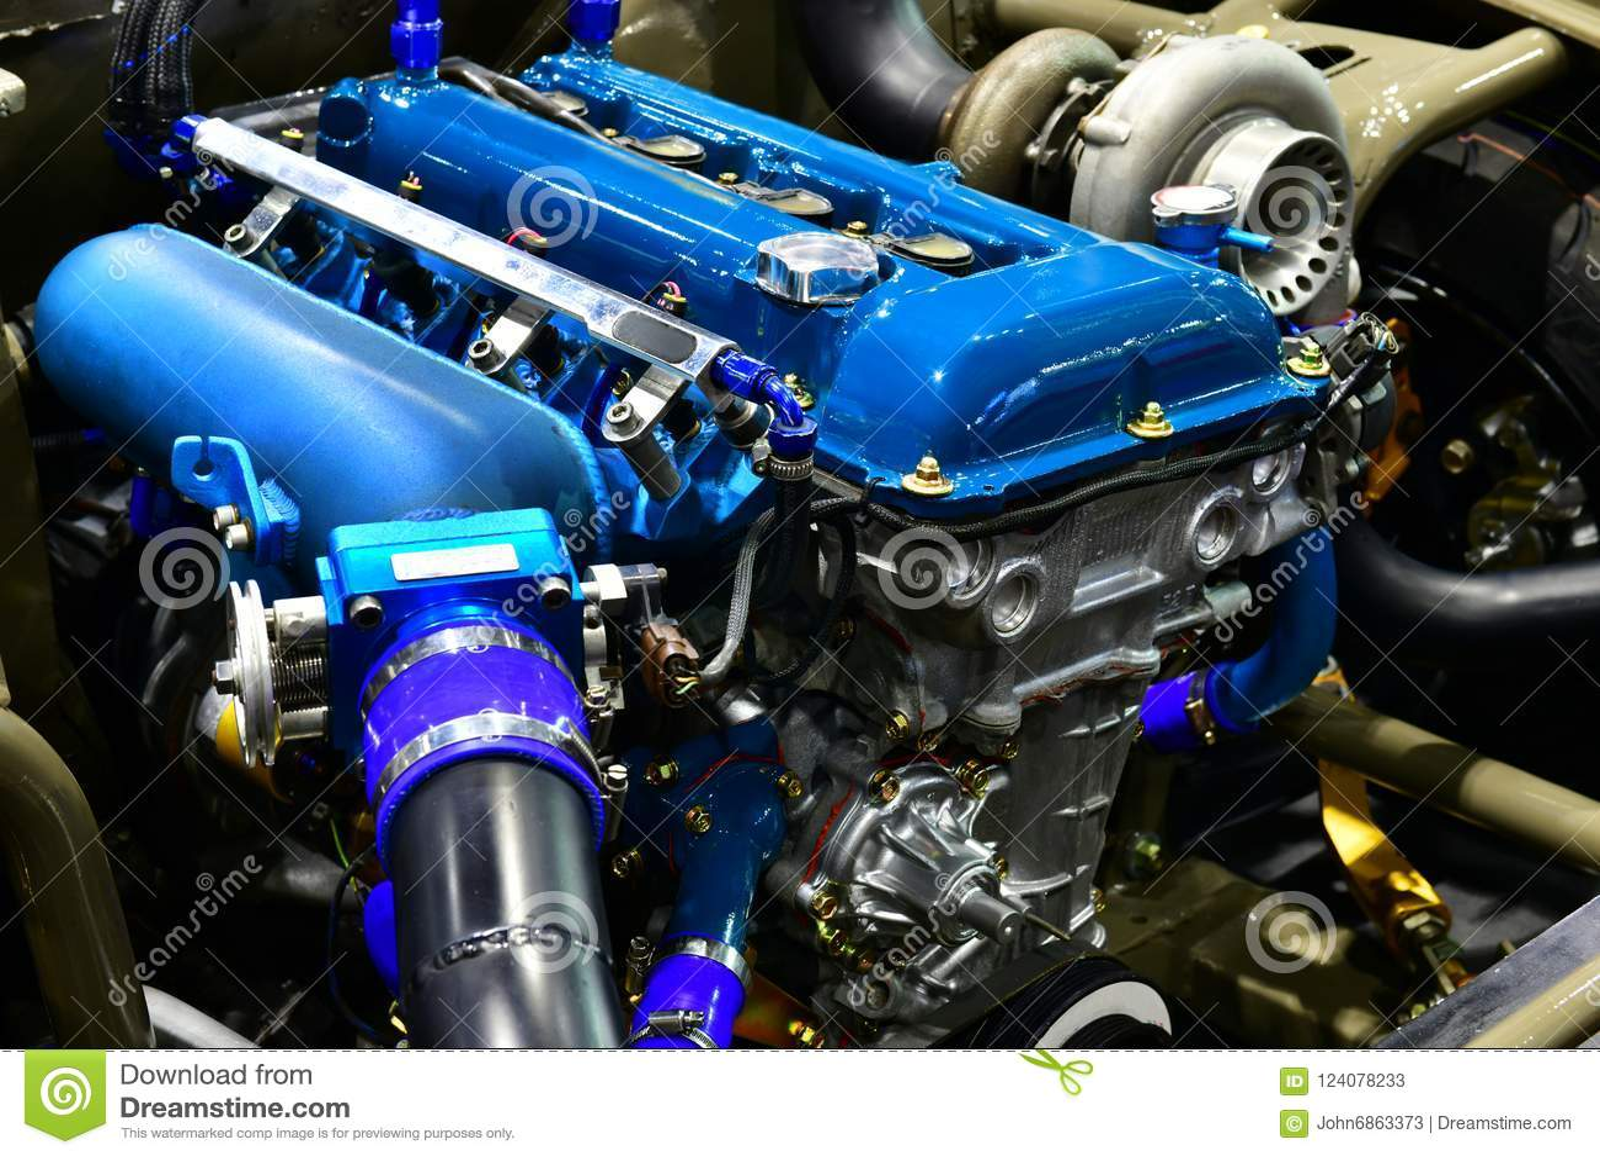 Car Engine  Modification Of The Engine Stock Image - Image